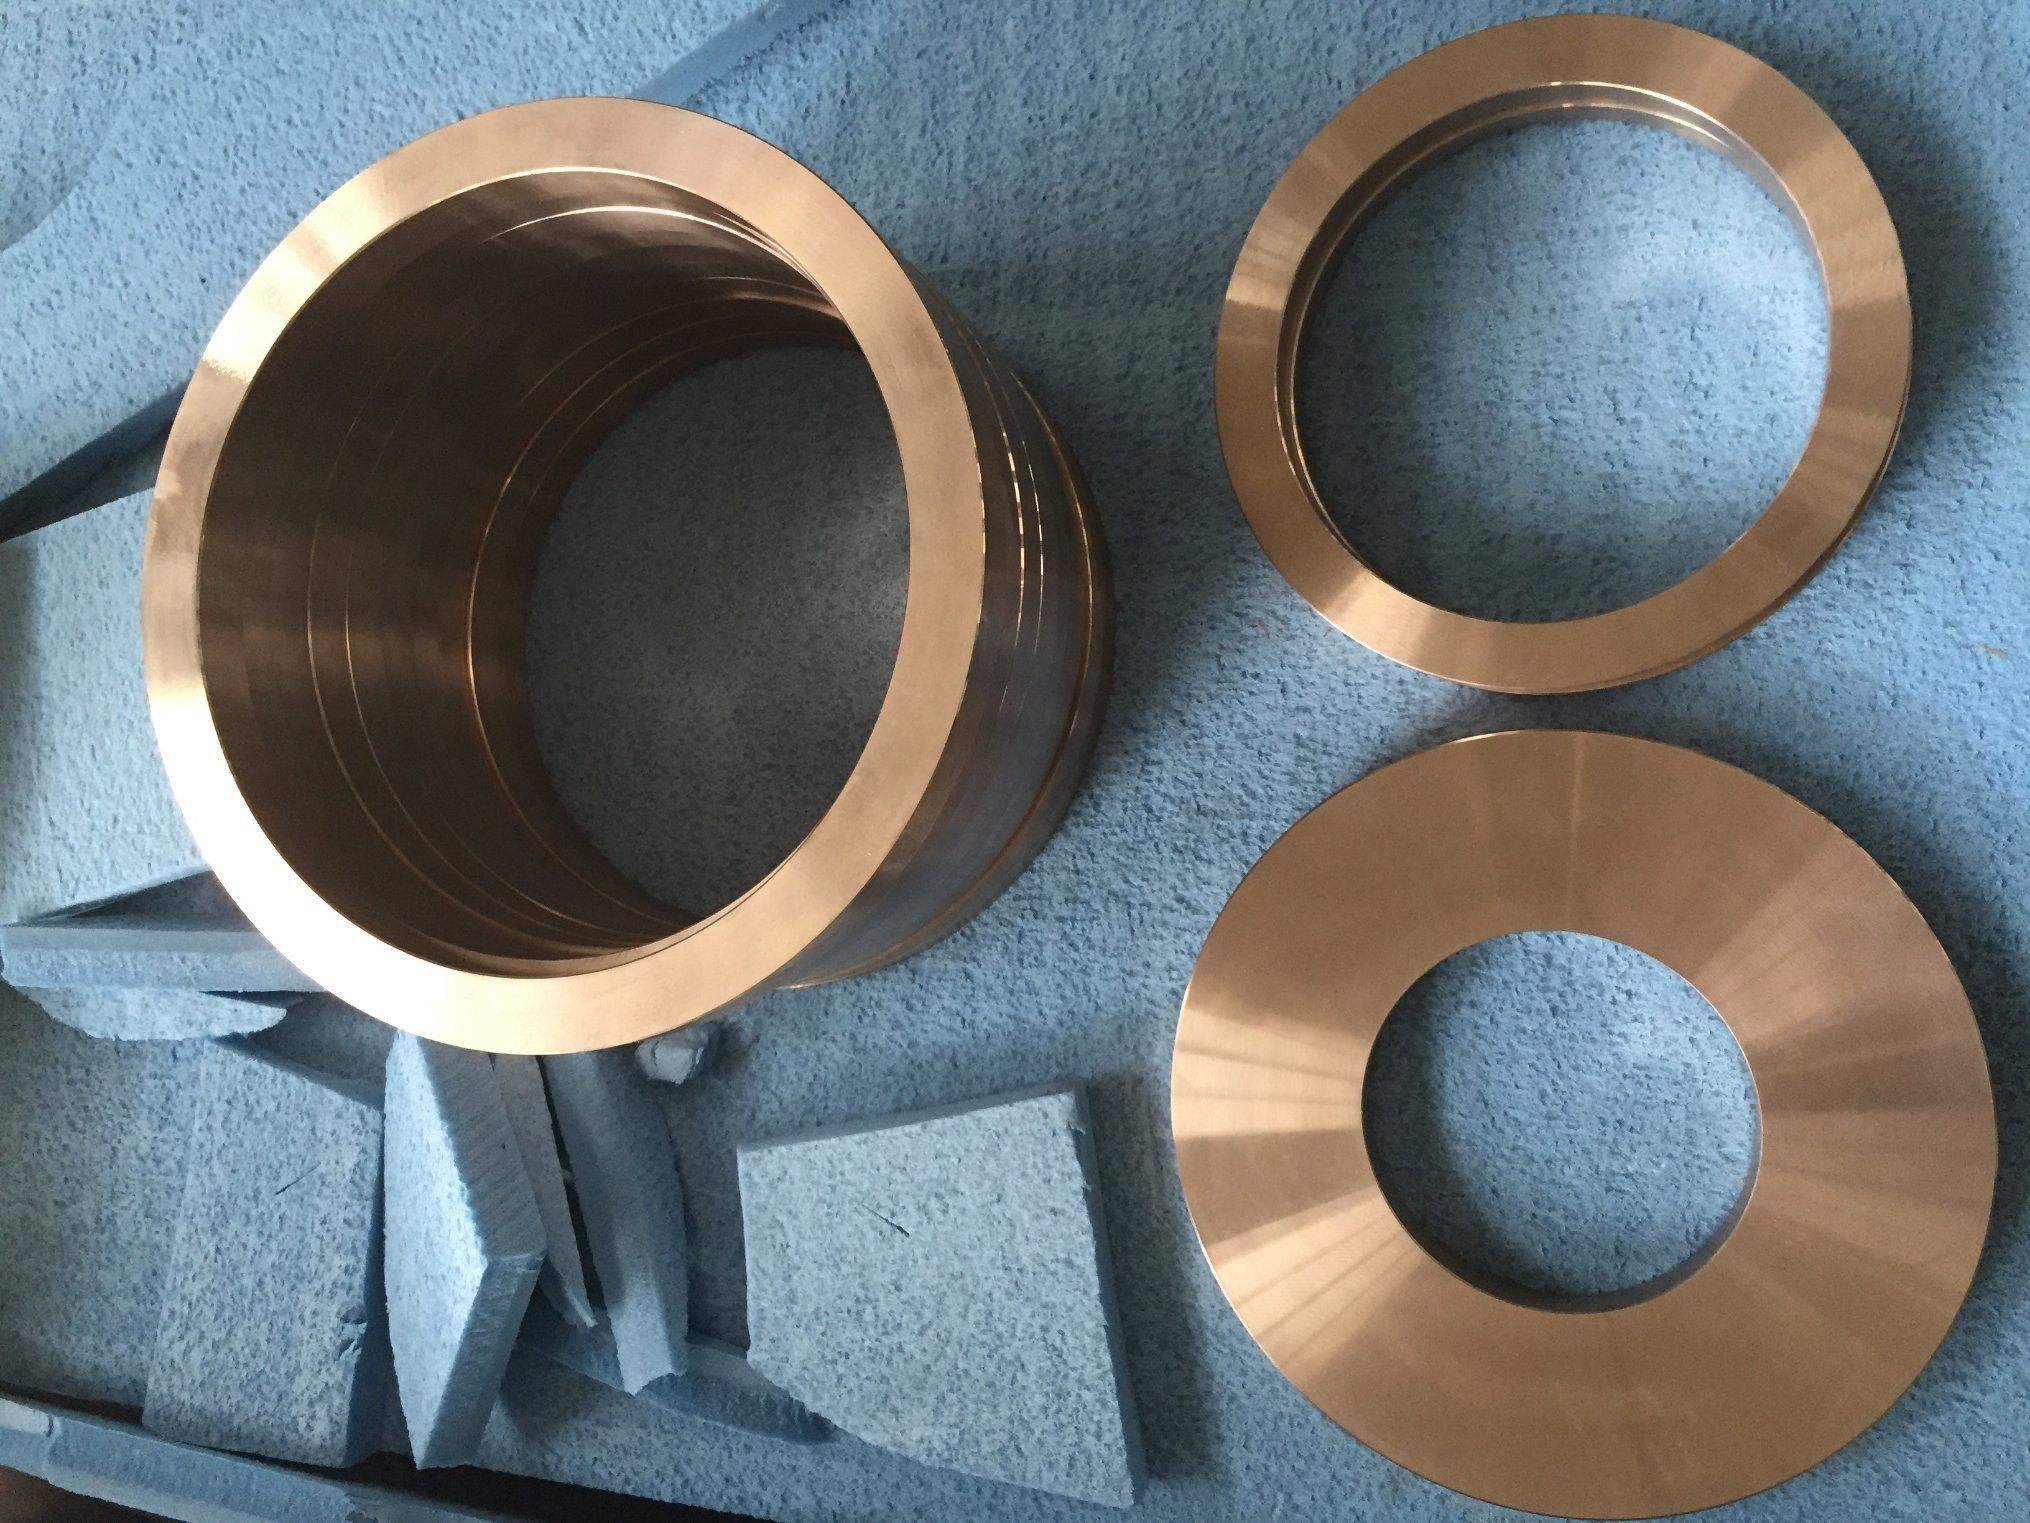 Copper Nickel Flange,Tube Sheet, Brass Blind Flange,C44300 , C46400, C70600, C7060X, C71500, Cu90ni10 and Bfe30-1-1,CuNi90/10 CuNi70/30,Cn102 Cn107 Copper Alloy